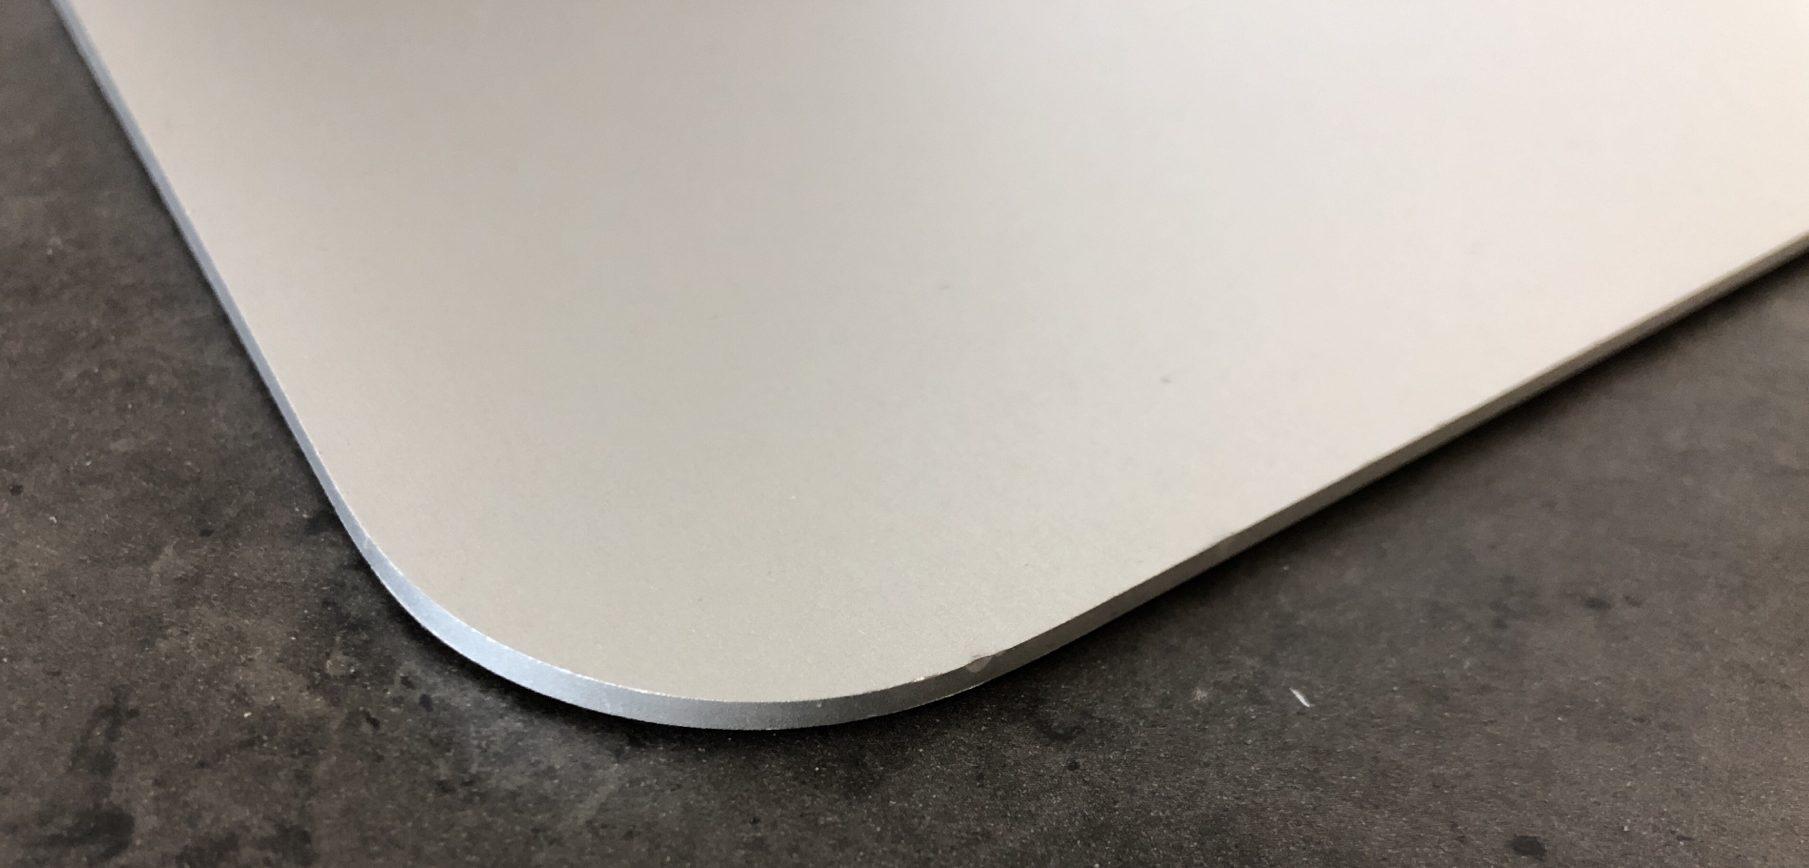 "iMac 27"" Retina 5K Late 2015 (Intel Quad-Core i7 4.0 GHz 32 GB RAM 1 TB Fusion Drive), Intel Quad-Core i7 4.0 GHz, 32 GB RAM, 1 TB Fusion Drive, Kuva 3"